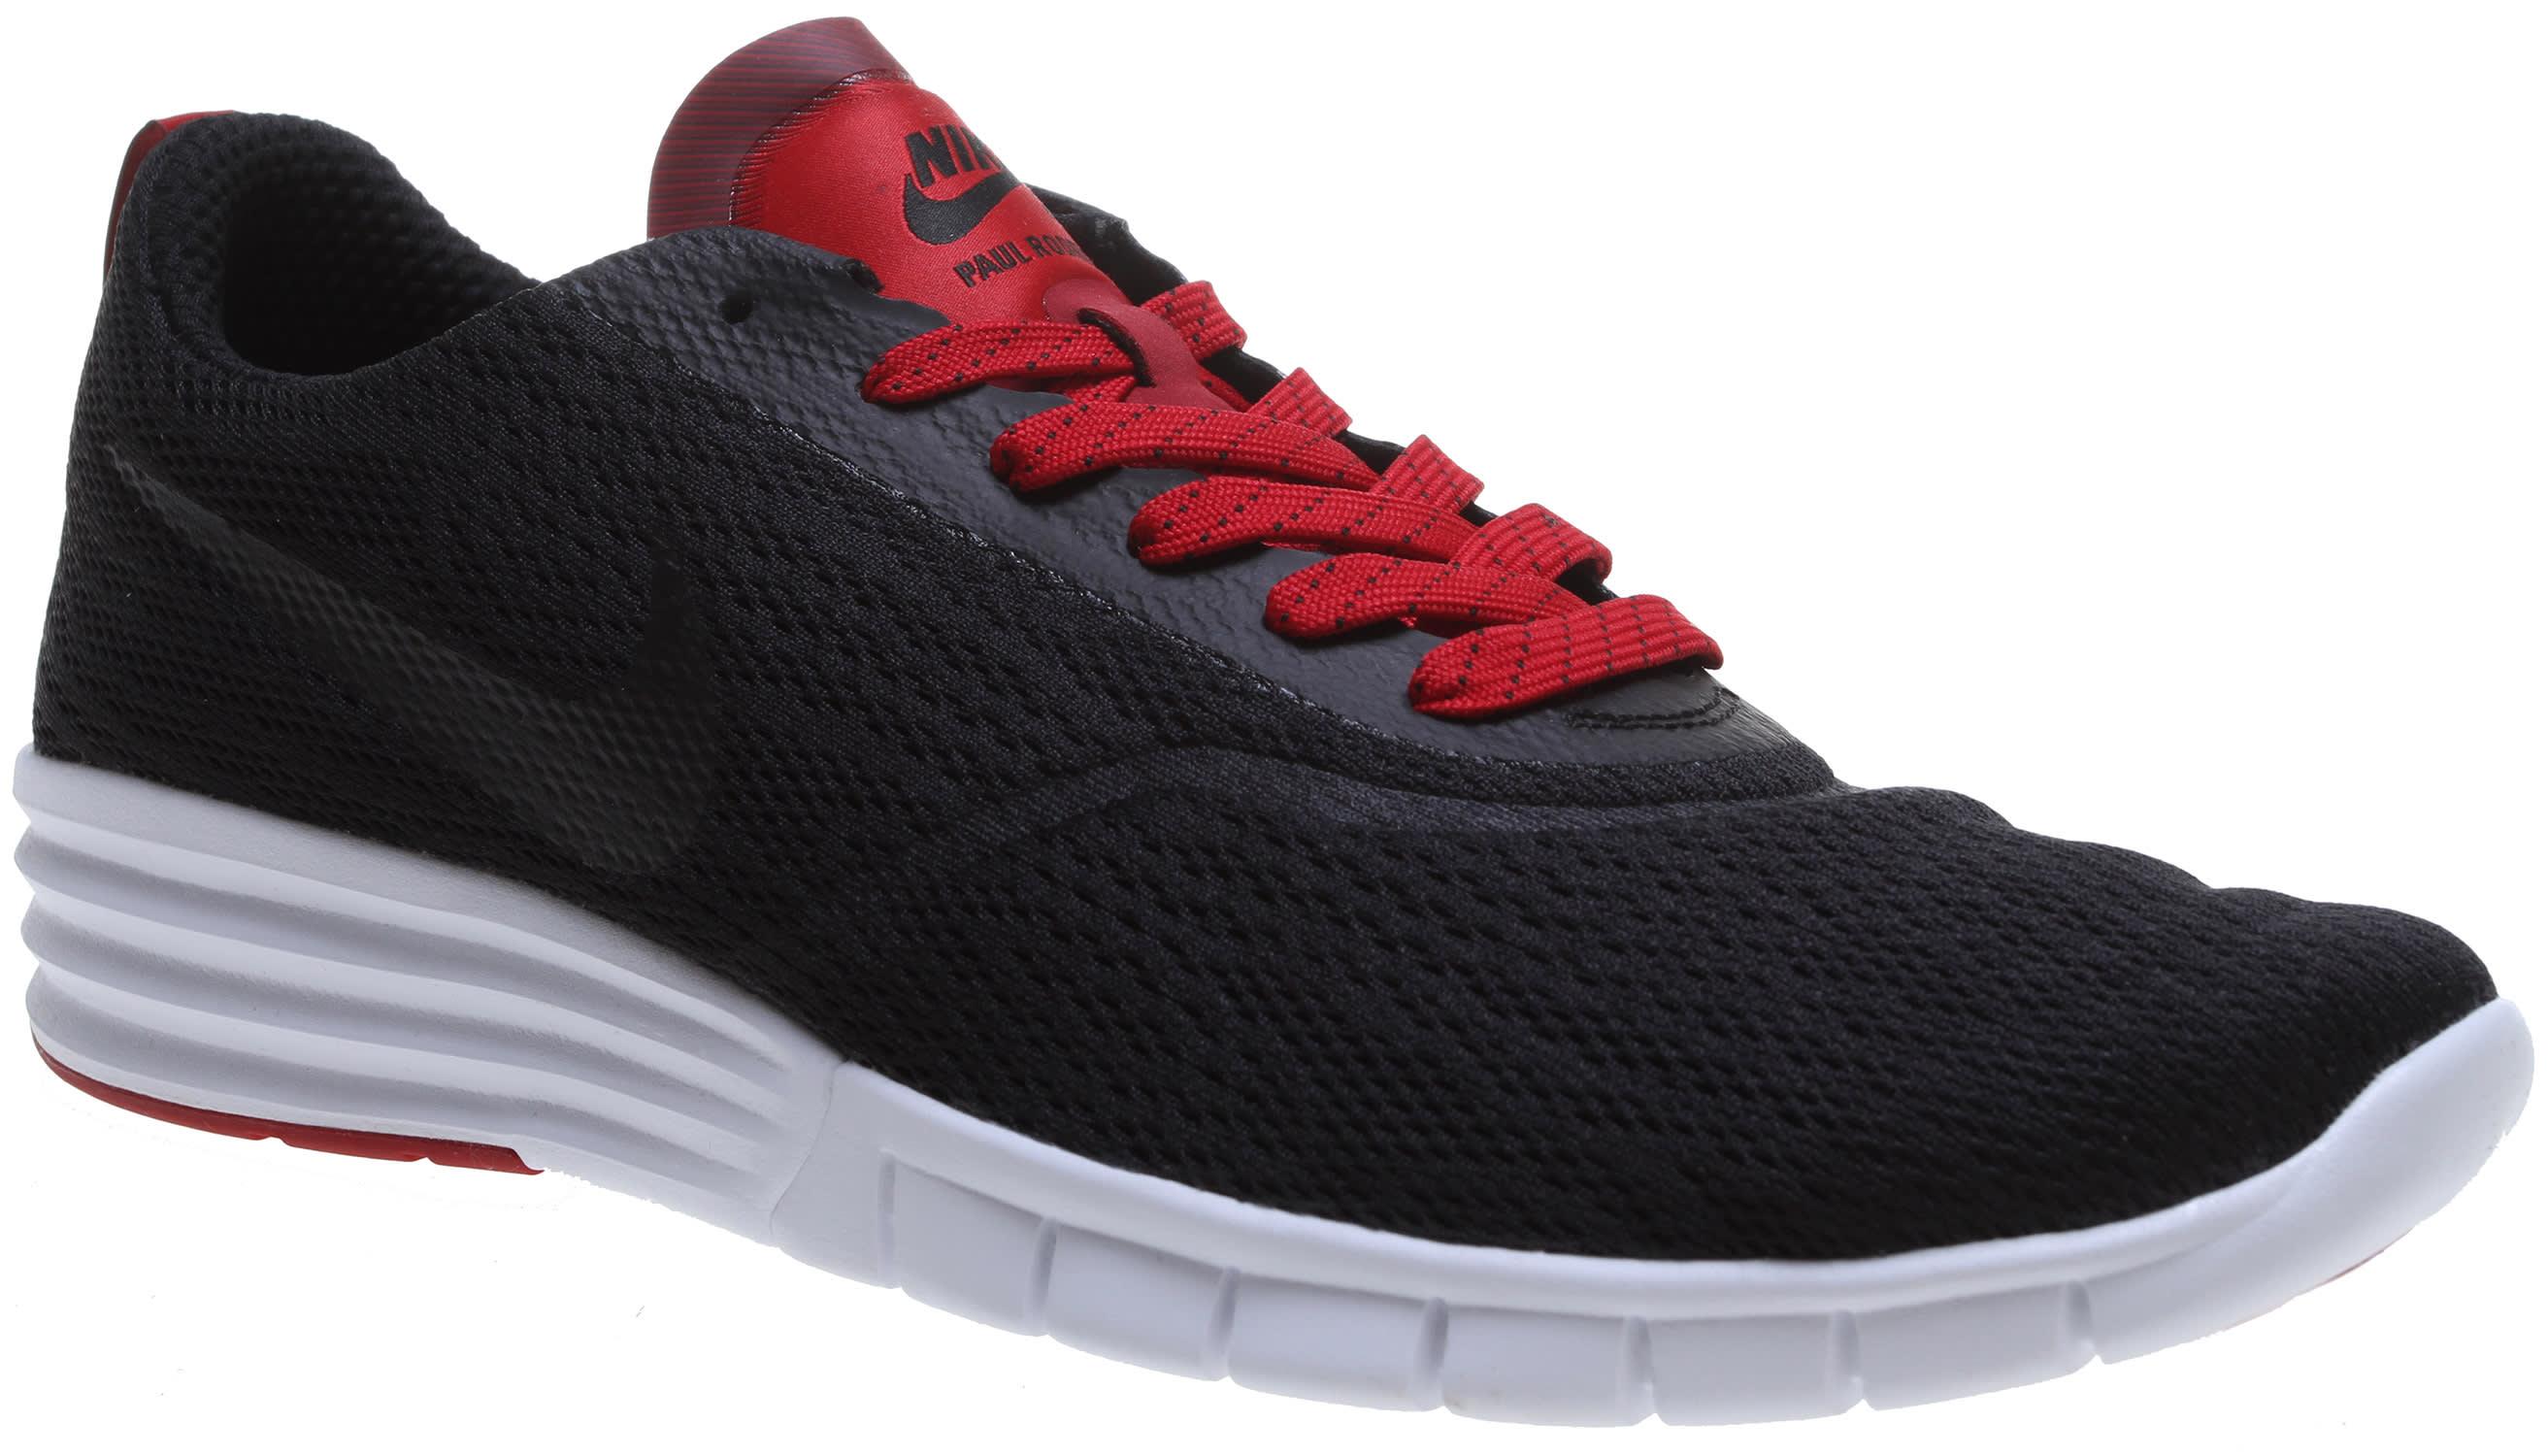 b57b9ebdaf8a Nike Paul Rodriguez Skate Shoes - thumbnail 2